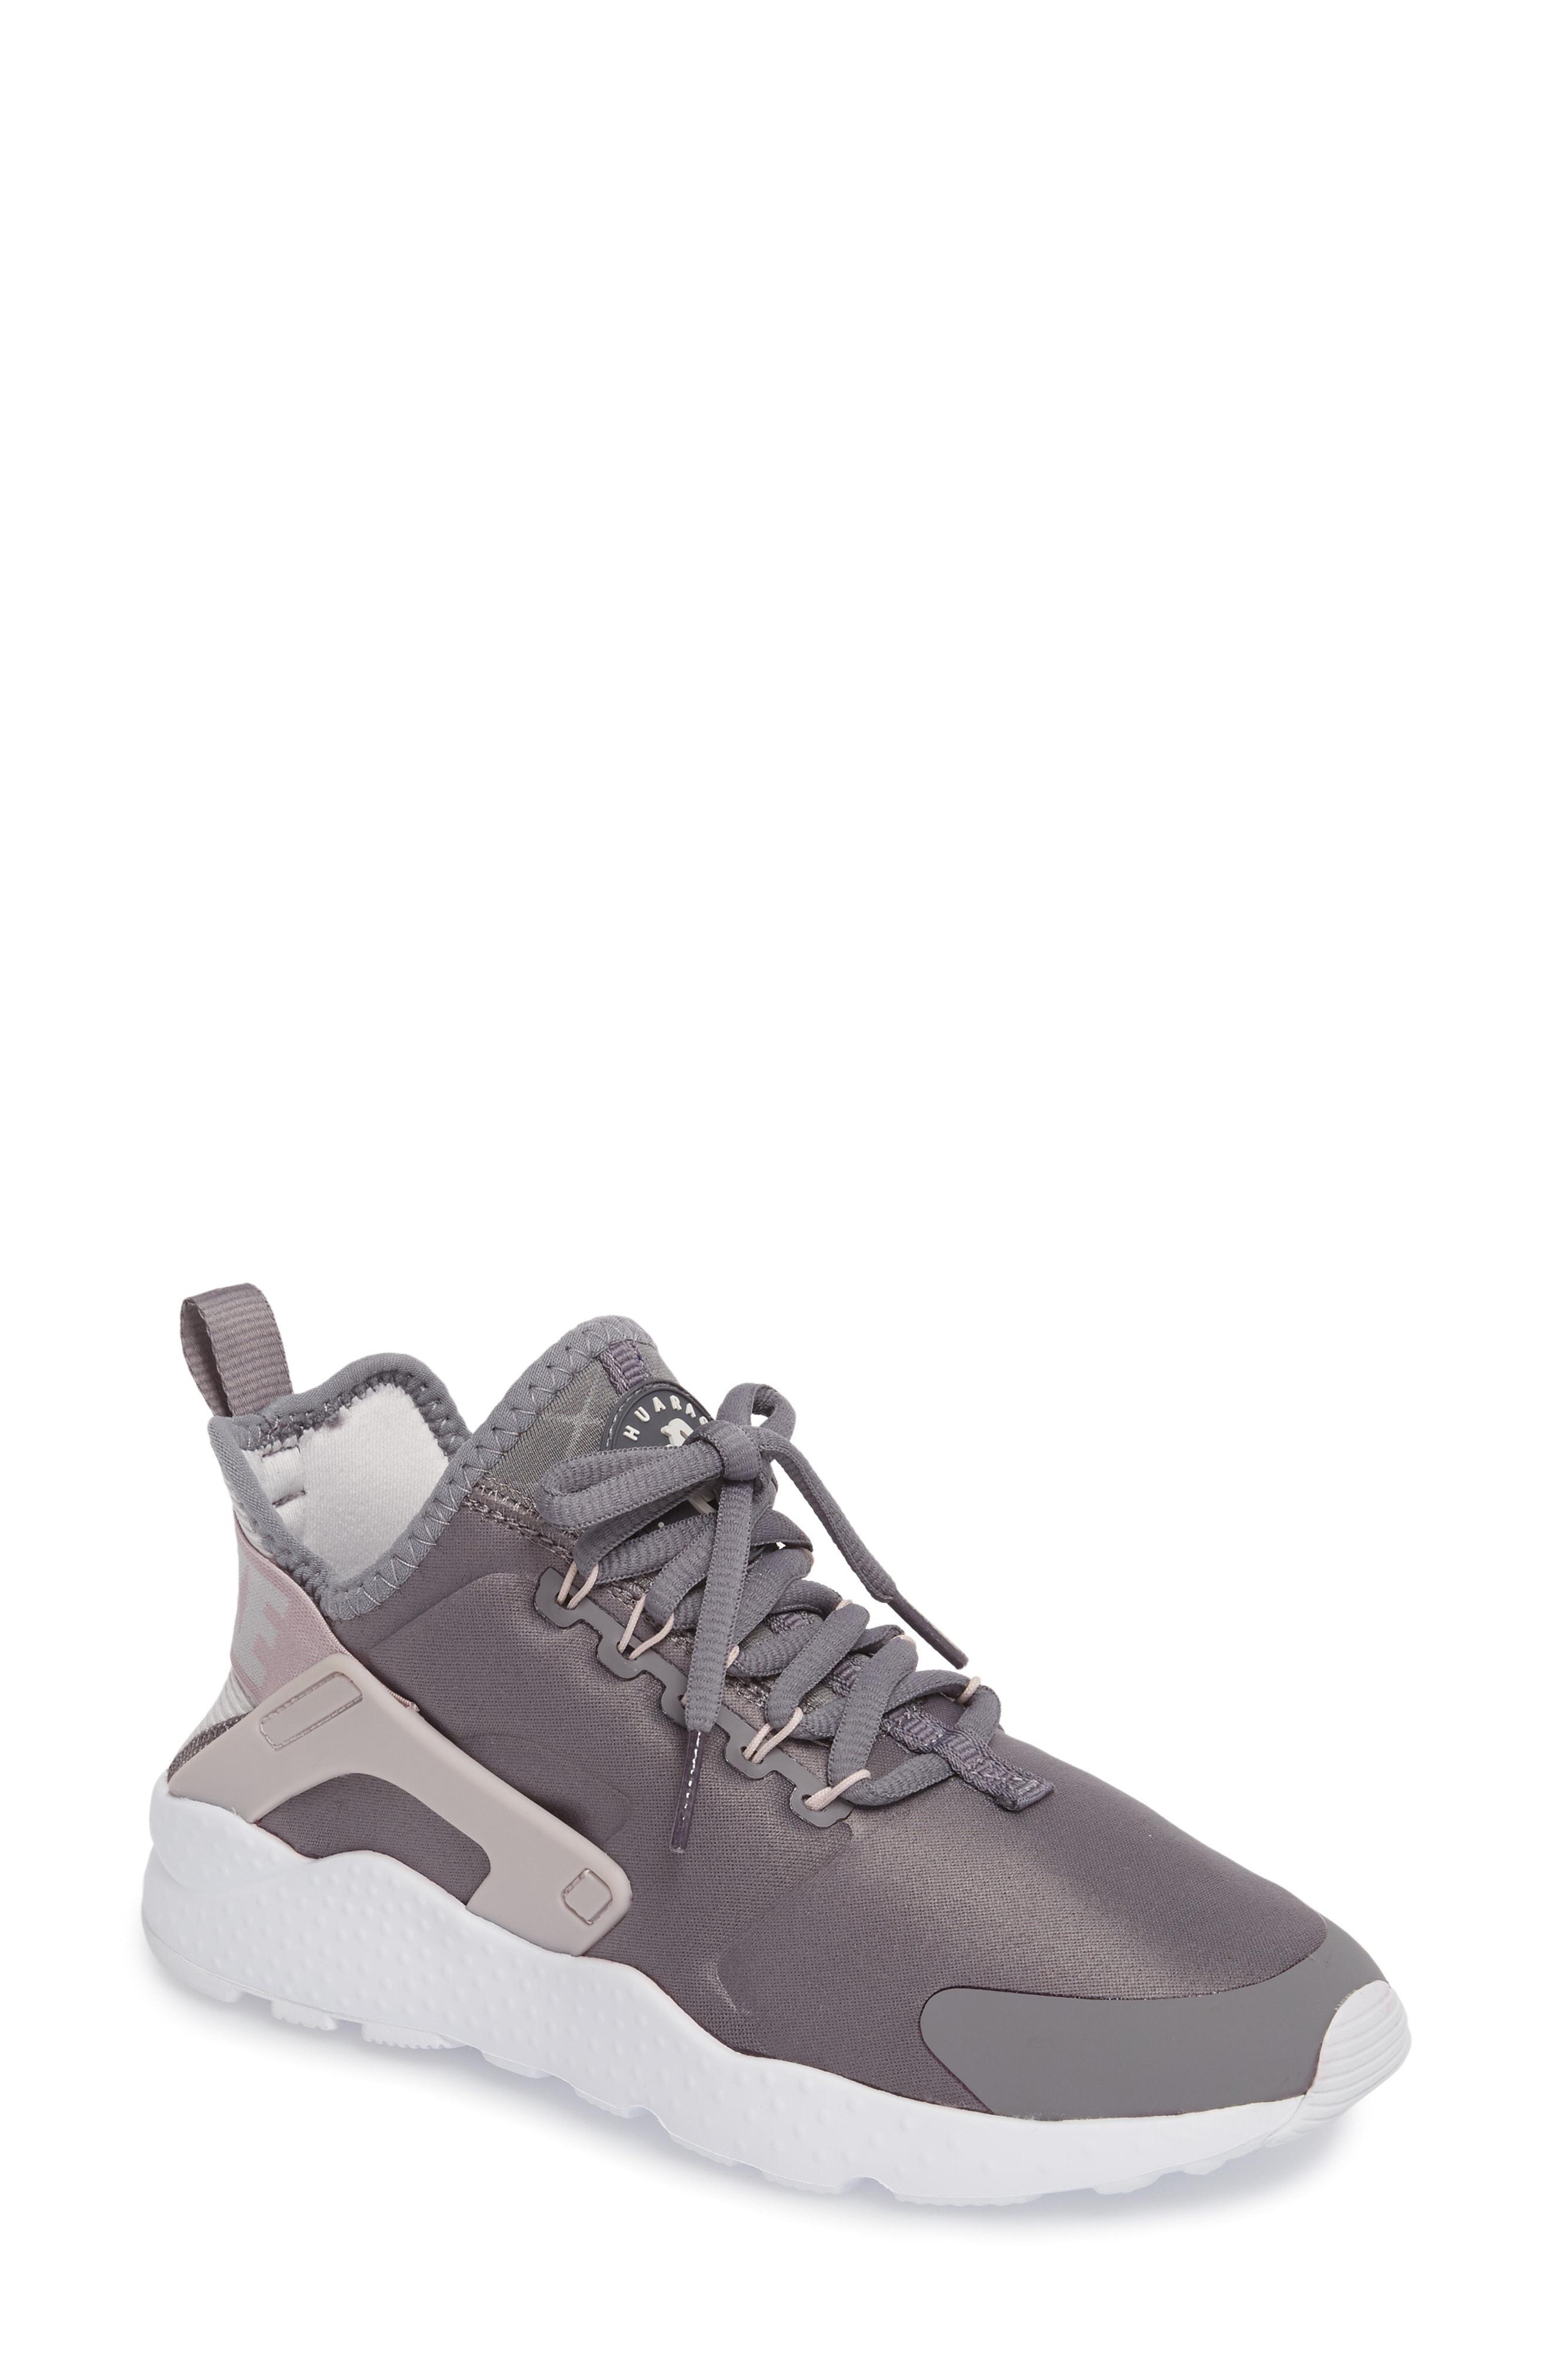 4d585aba5c5f Nike Women s Air Huarache Run Ultra Running Sneakers From Finish Line In  Gunsmoke Vast Grey